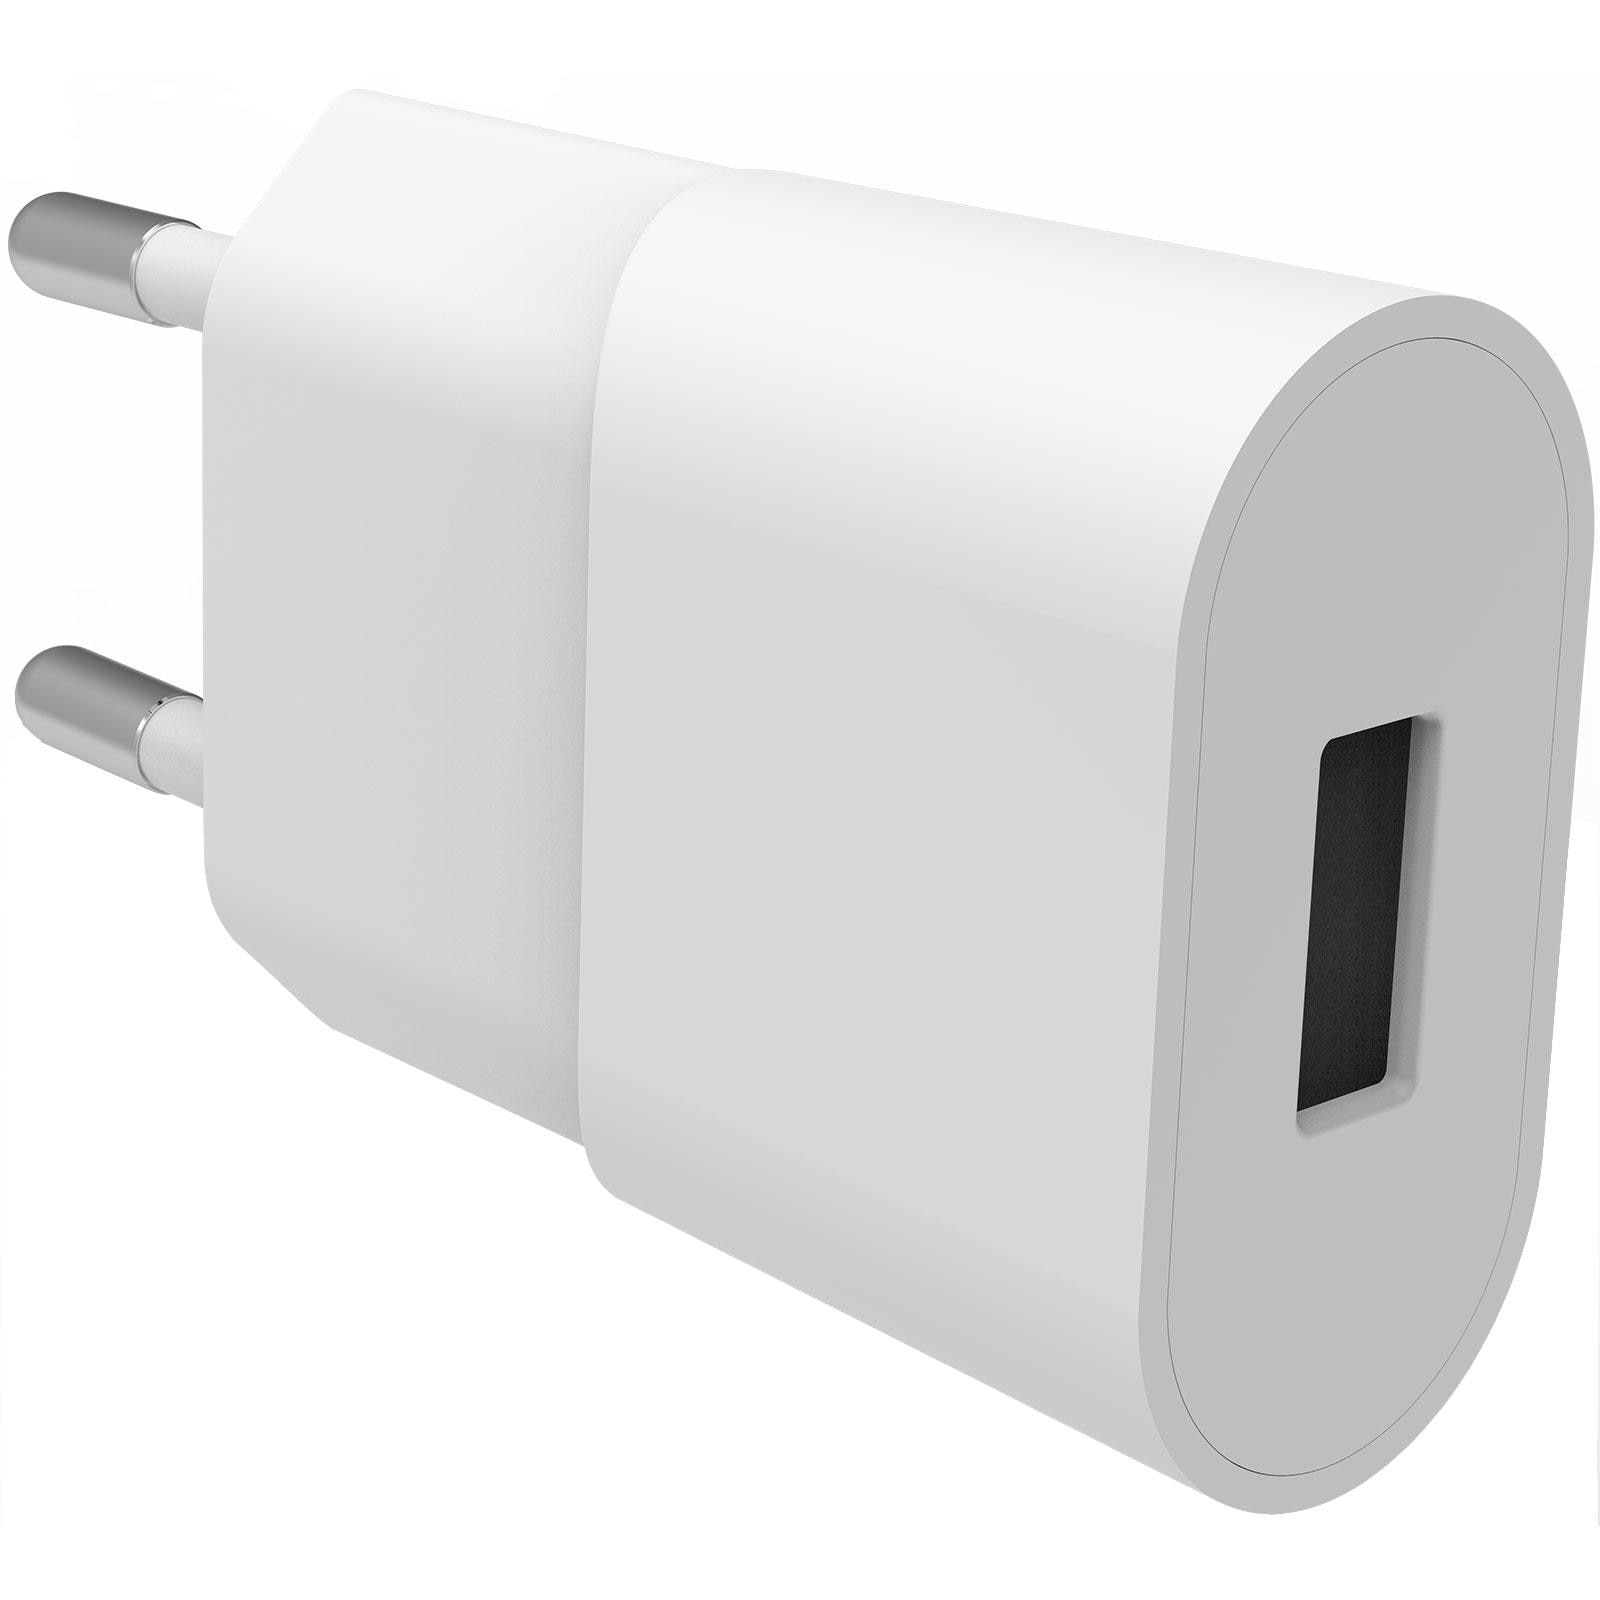 USB Wall Charger 1A valkoinen